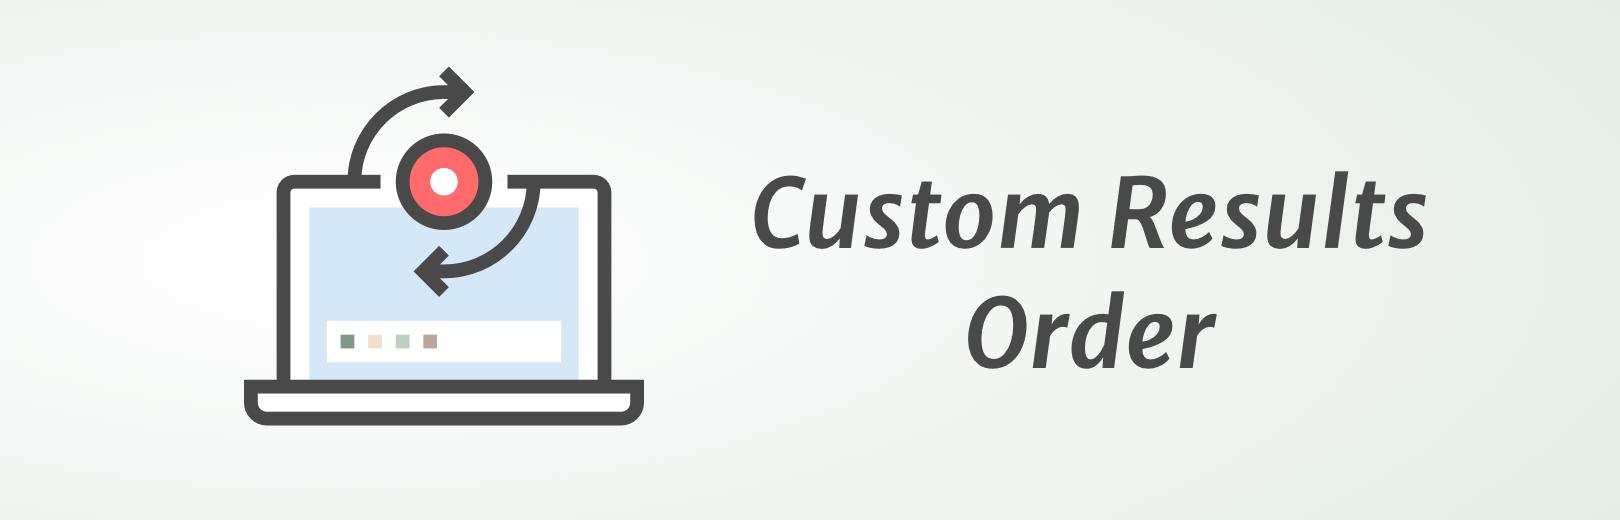 Custom Results Order